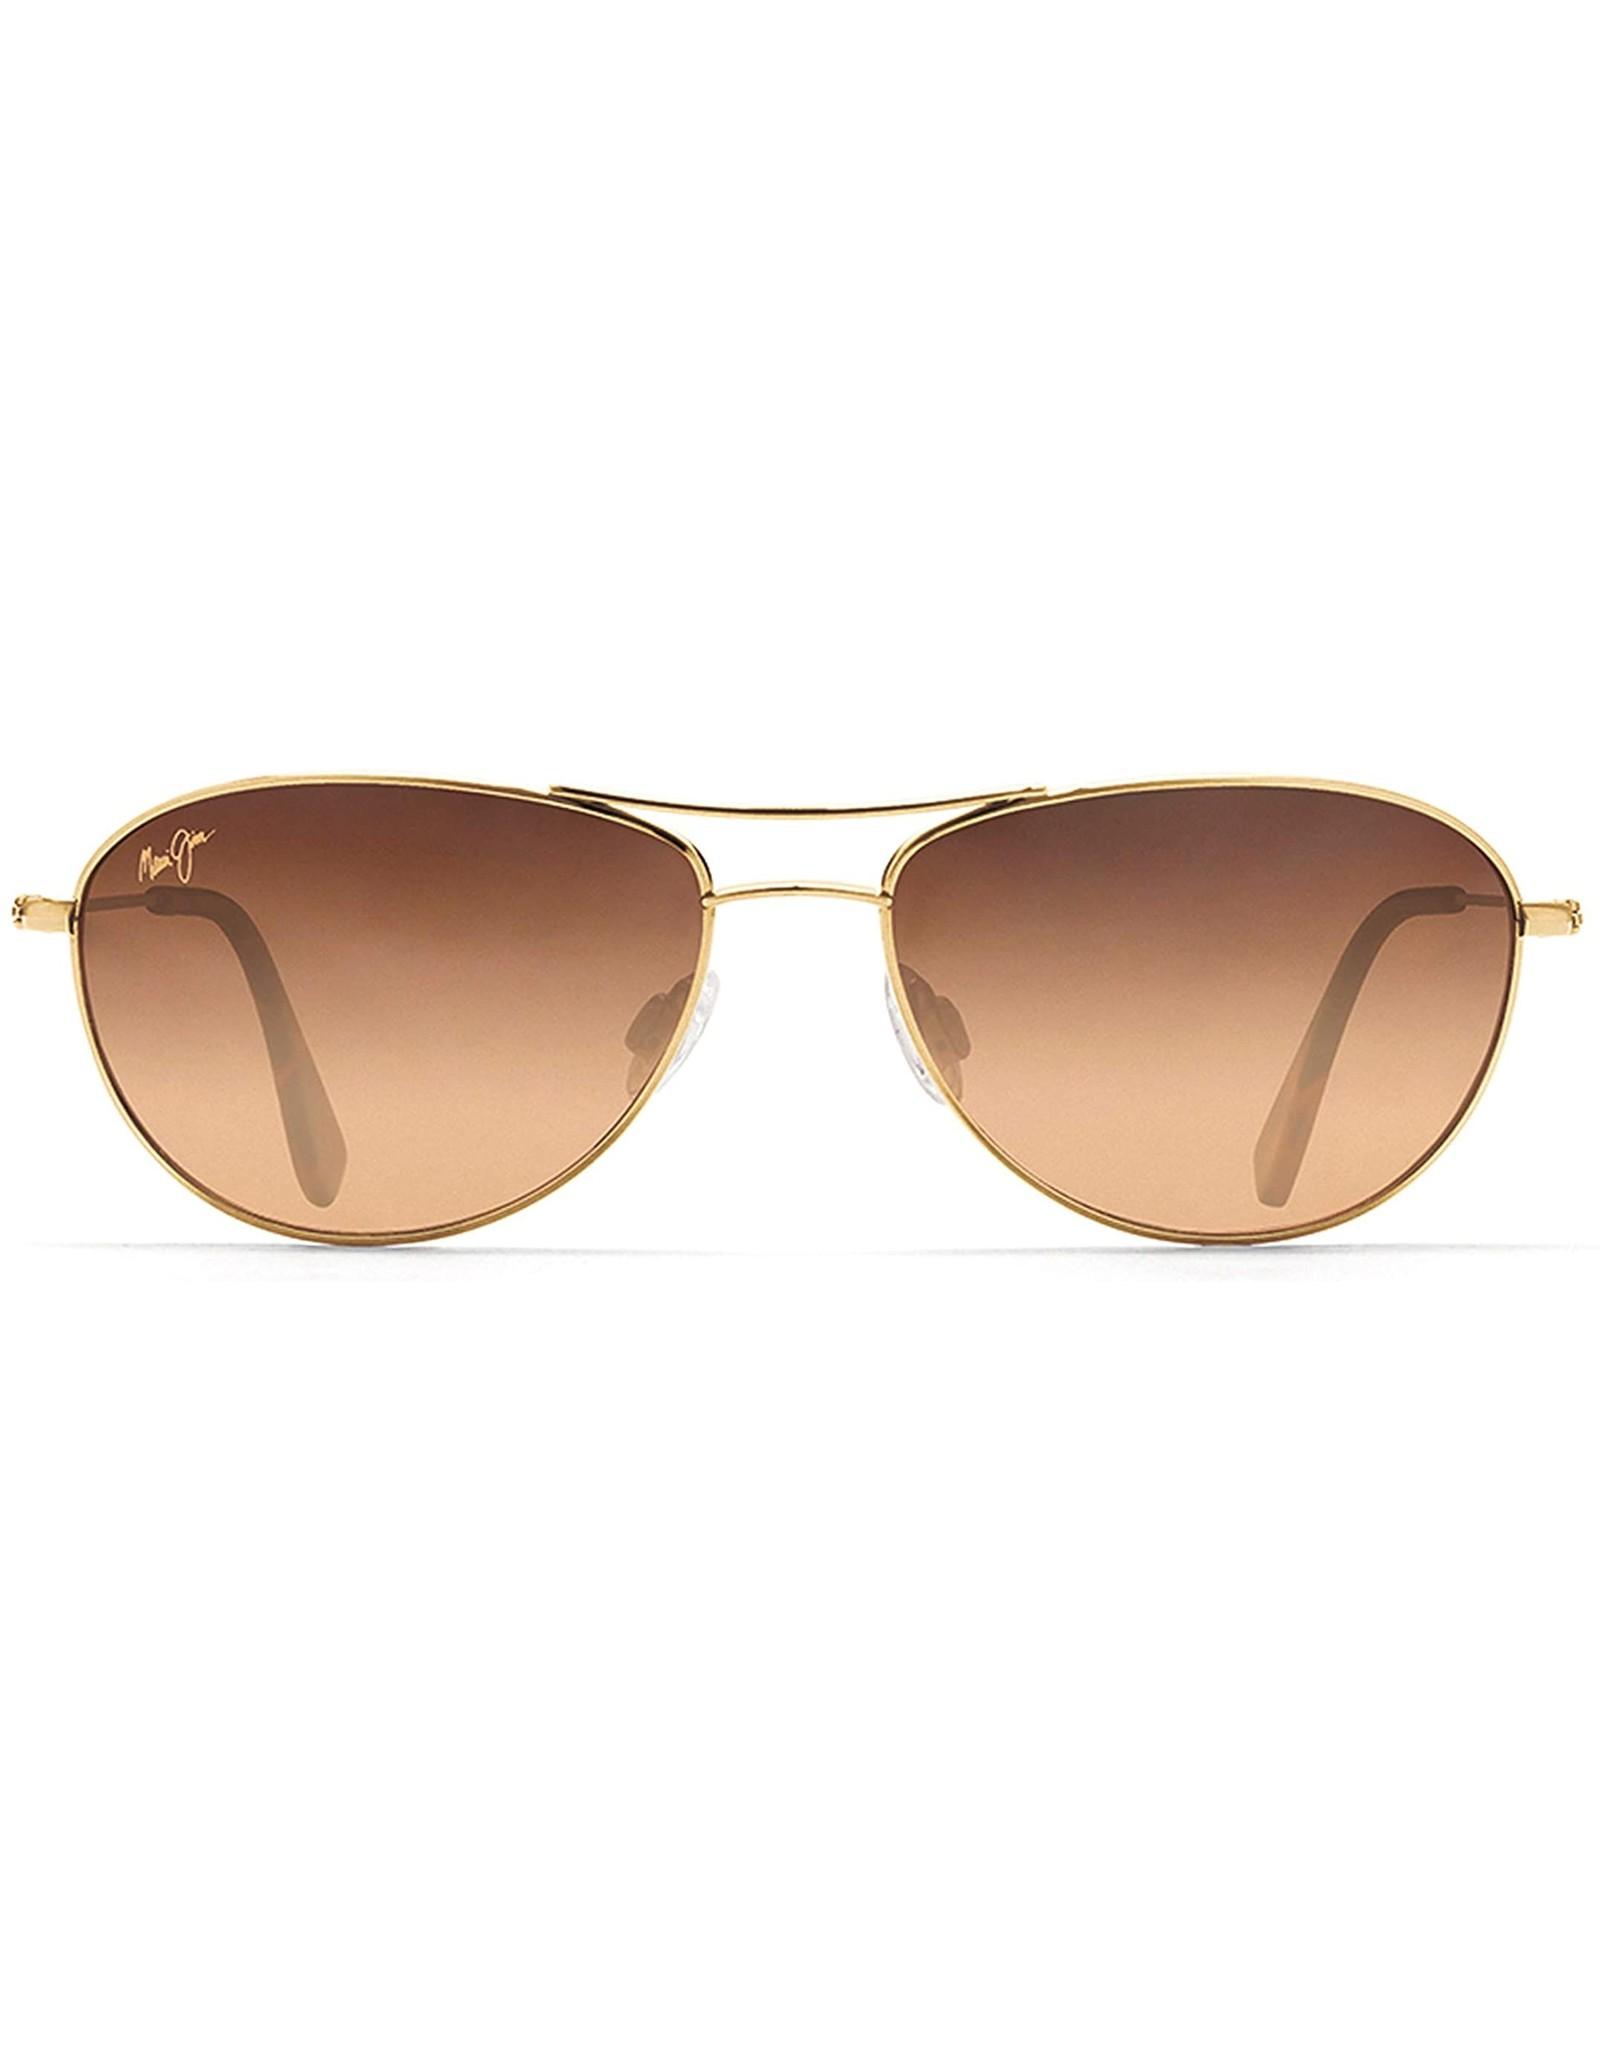 Maui Jim Maui Jim 'Beaches' Sunglasses